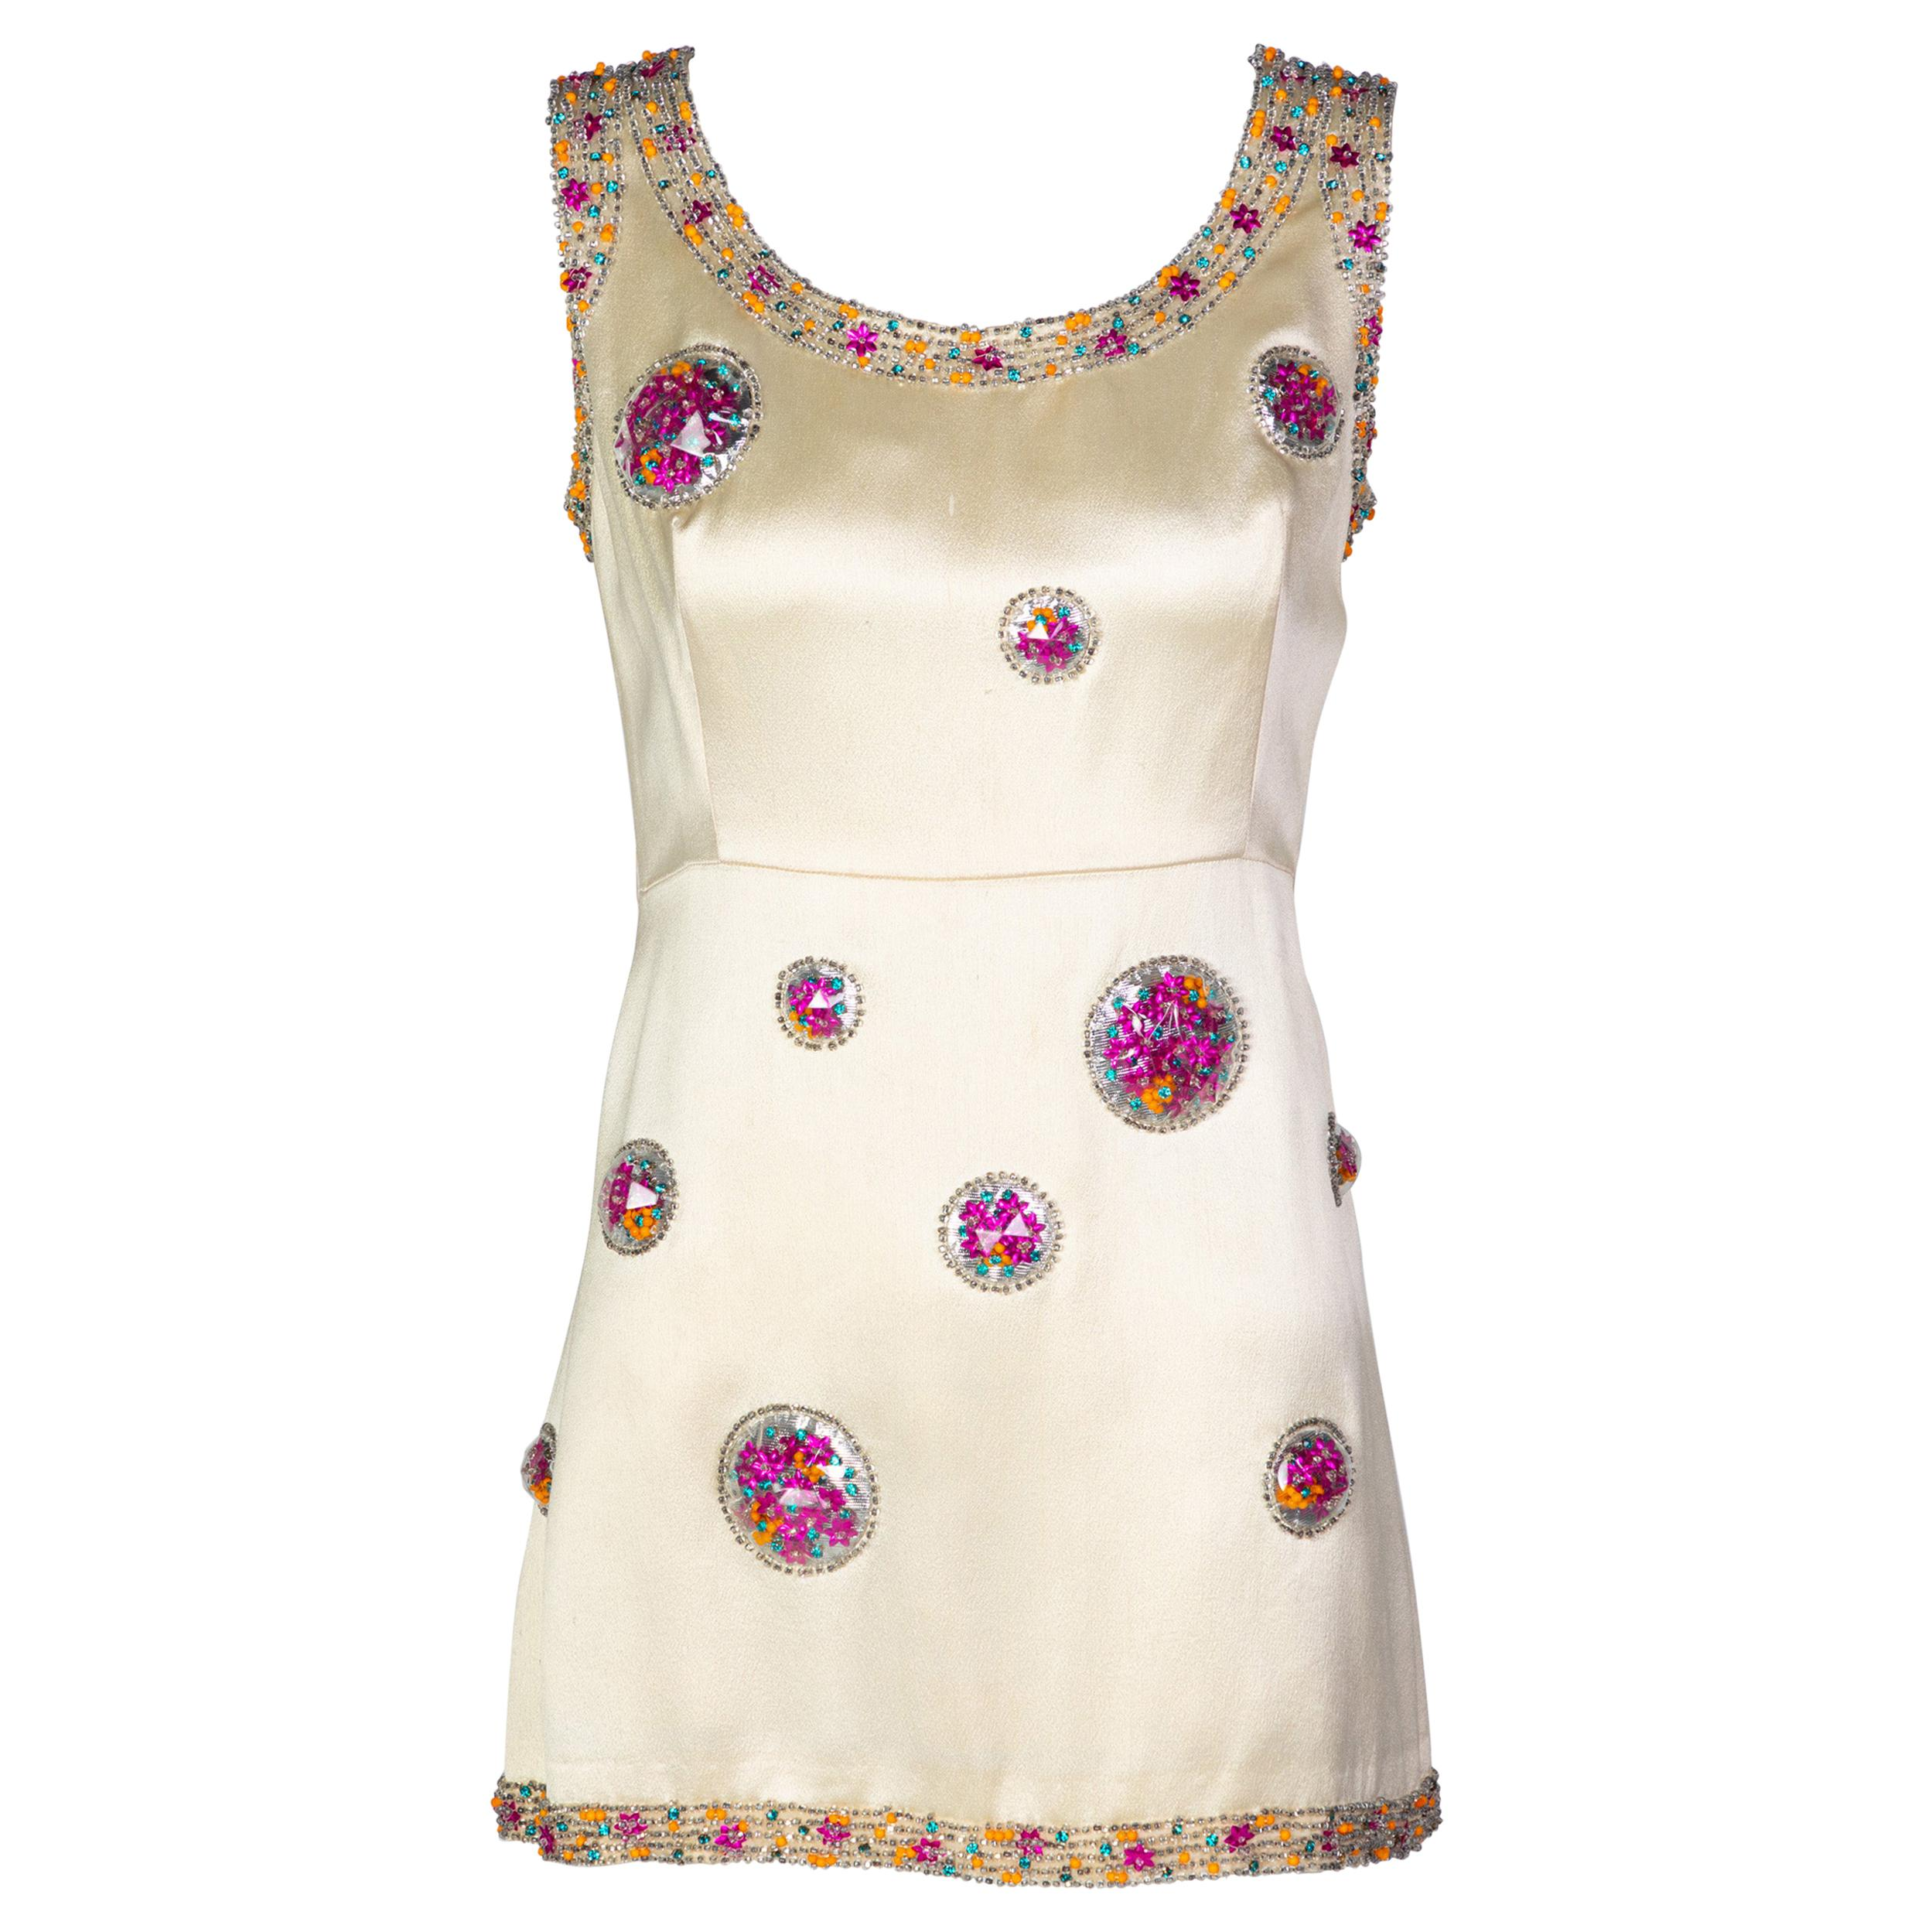 Chloé Karl Lagerfeld Documented Cream Satin Beaded Pod Applique Mini dress, 1969